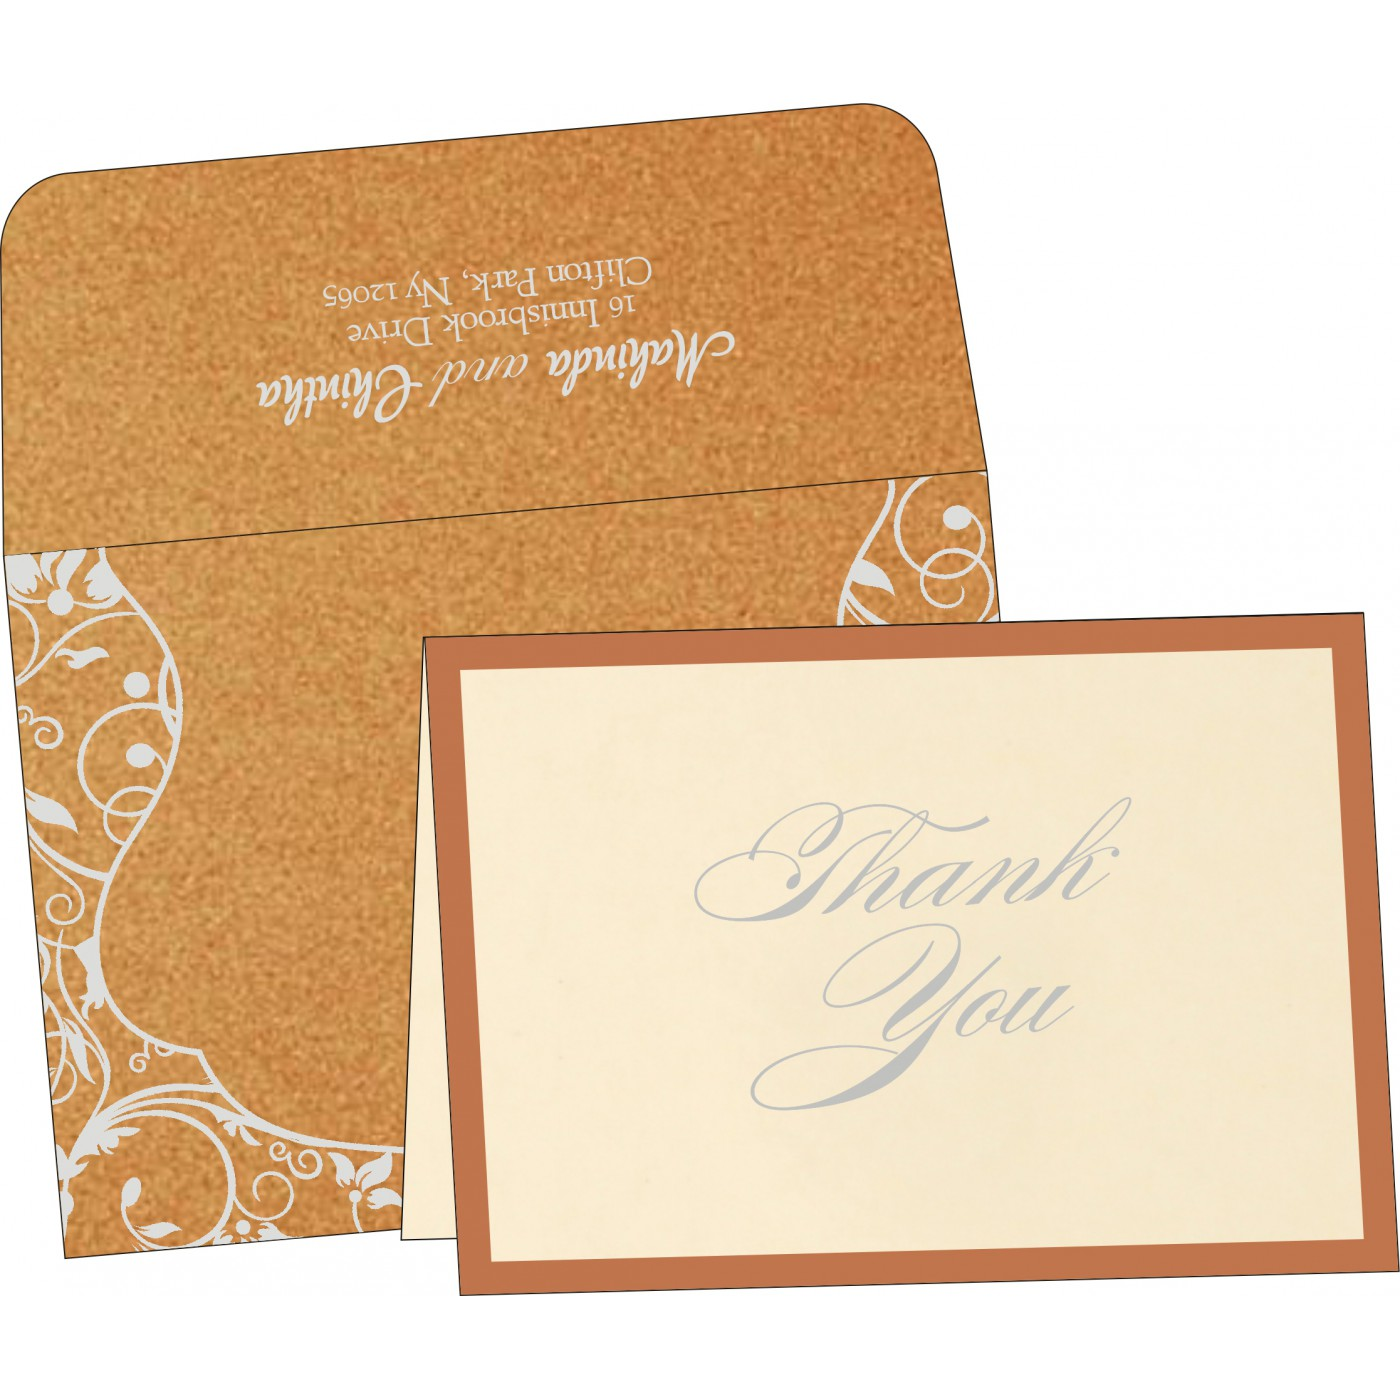 Thank You Cards : TYC-8229O - 123WeddingCards